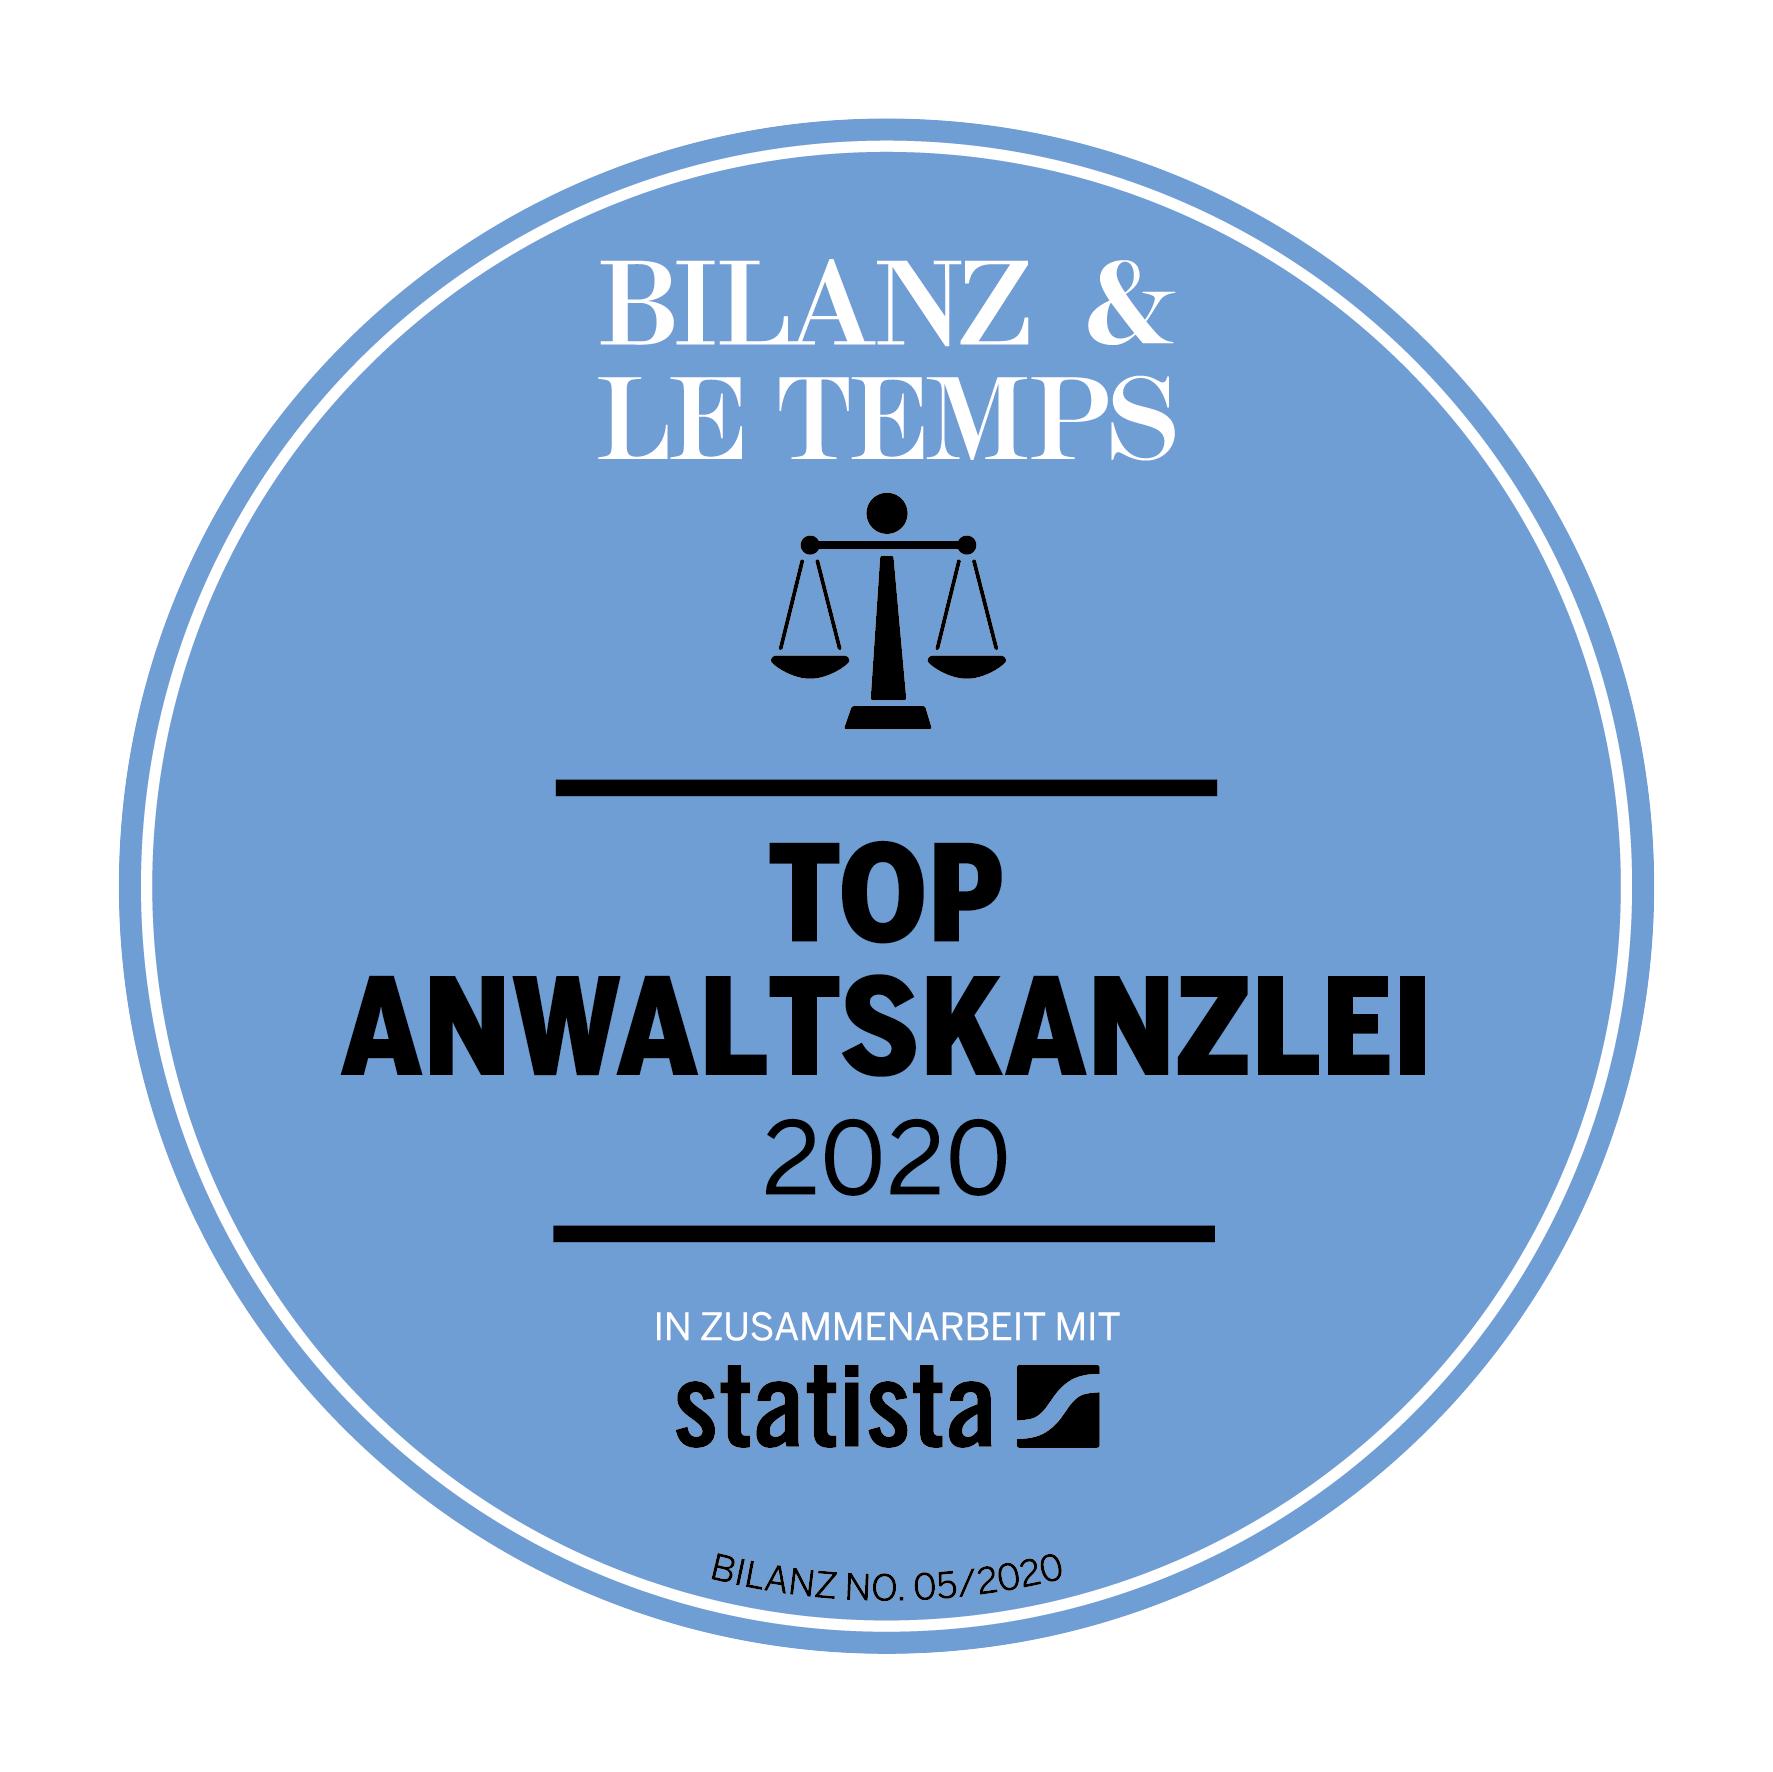 Bilanz Top Anwaltskanslei 2020